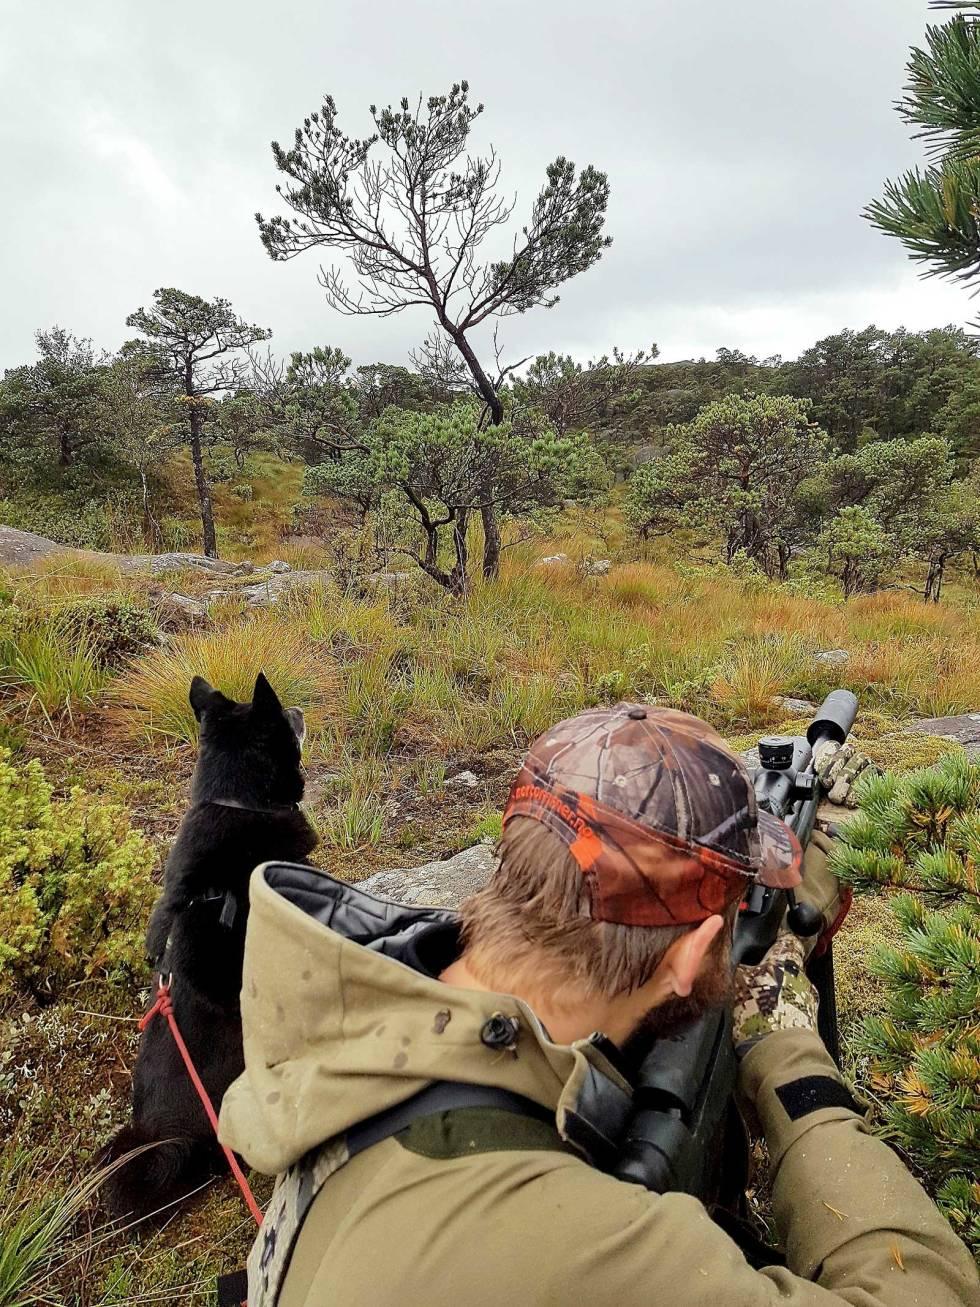 Jakt-med-bandhund-6